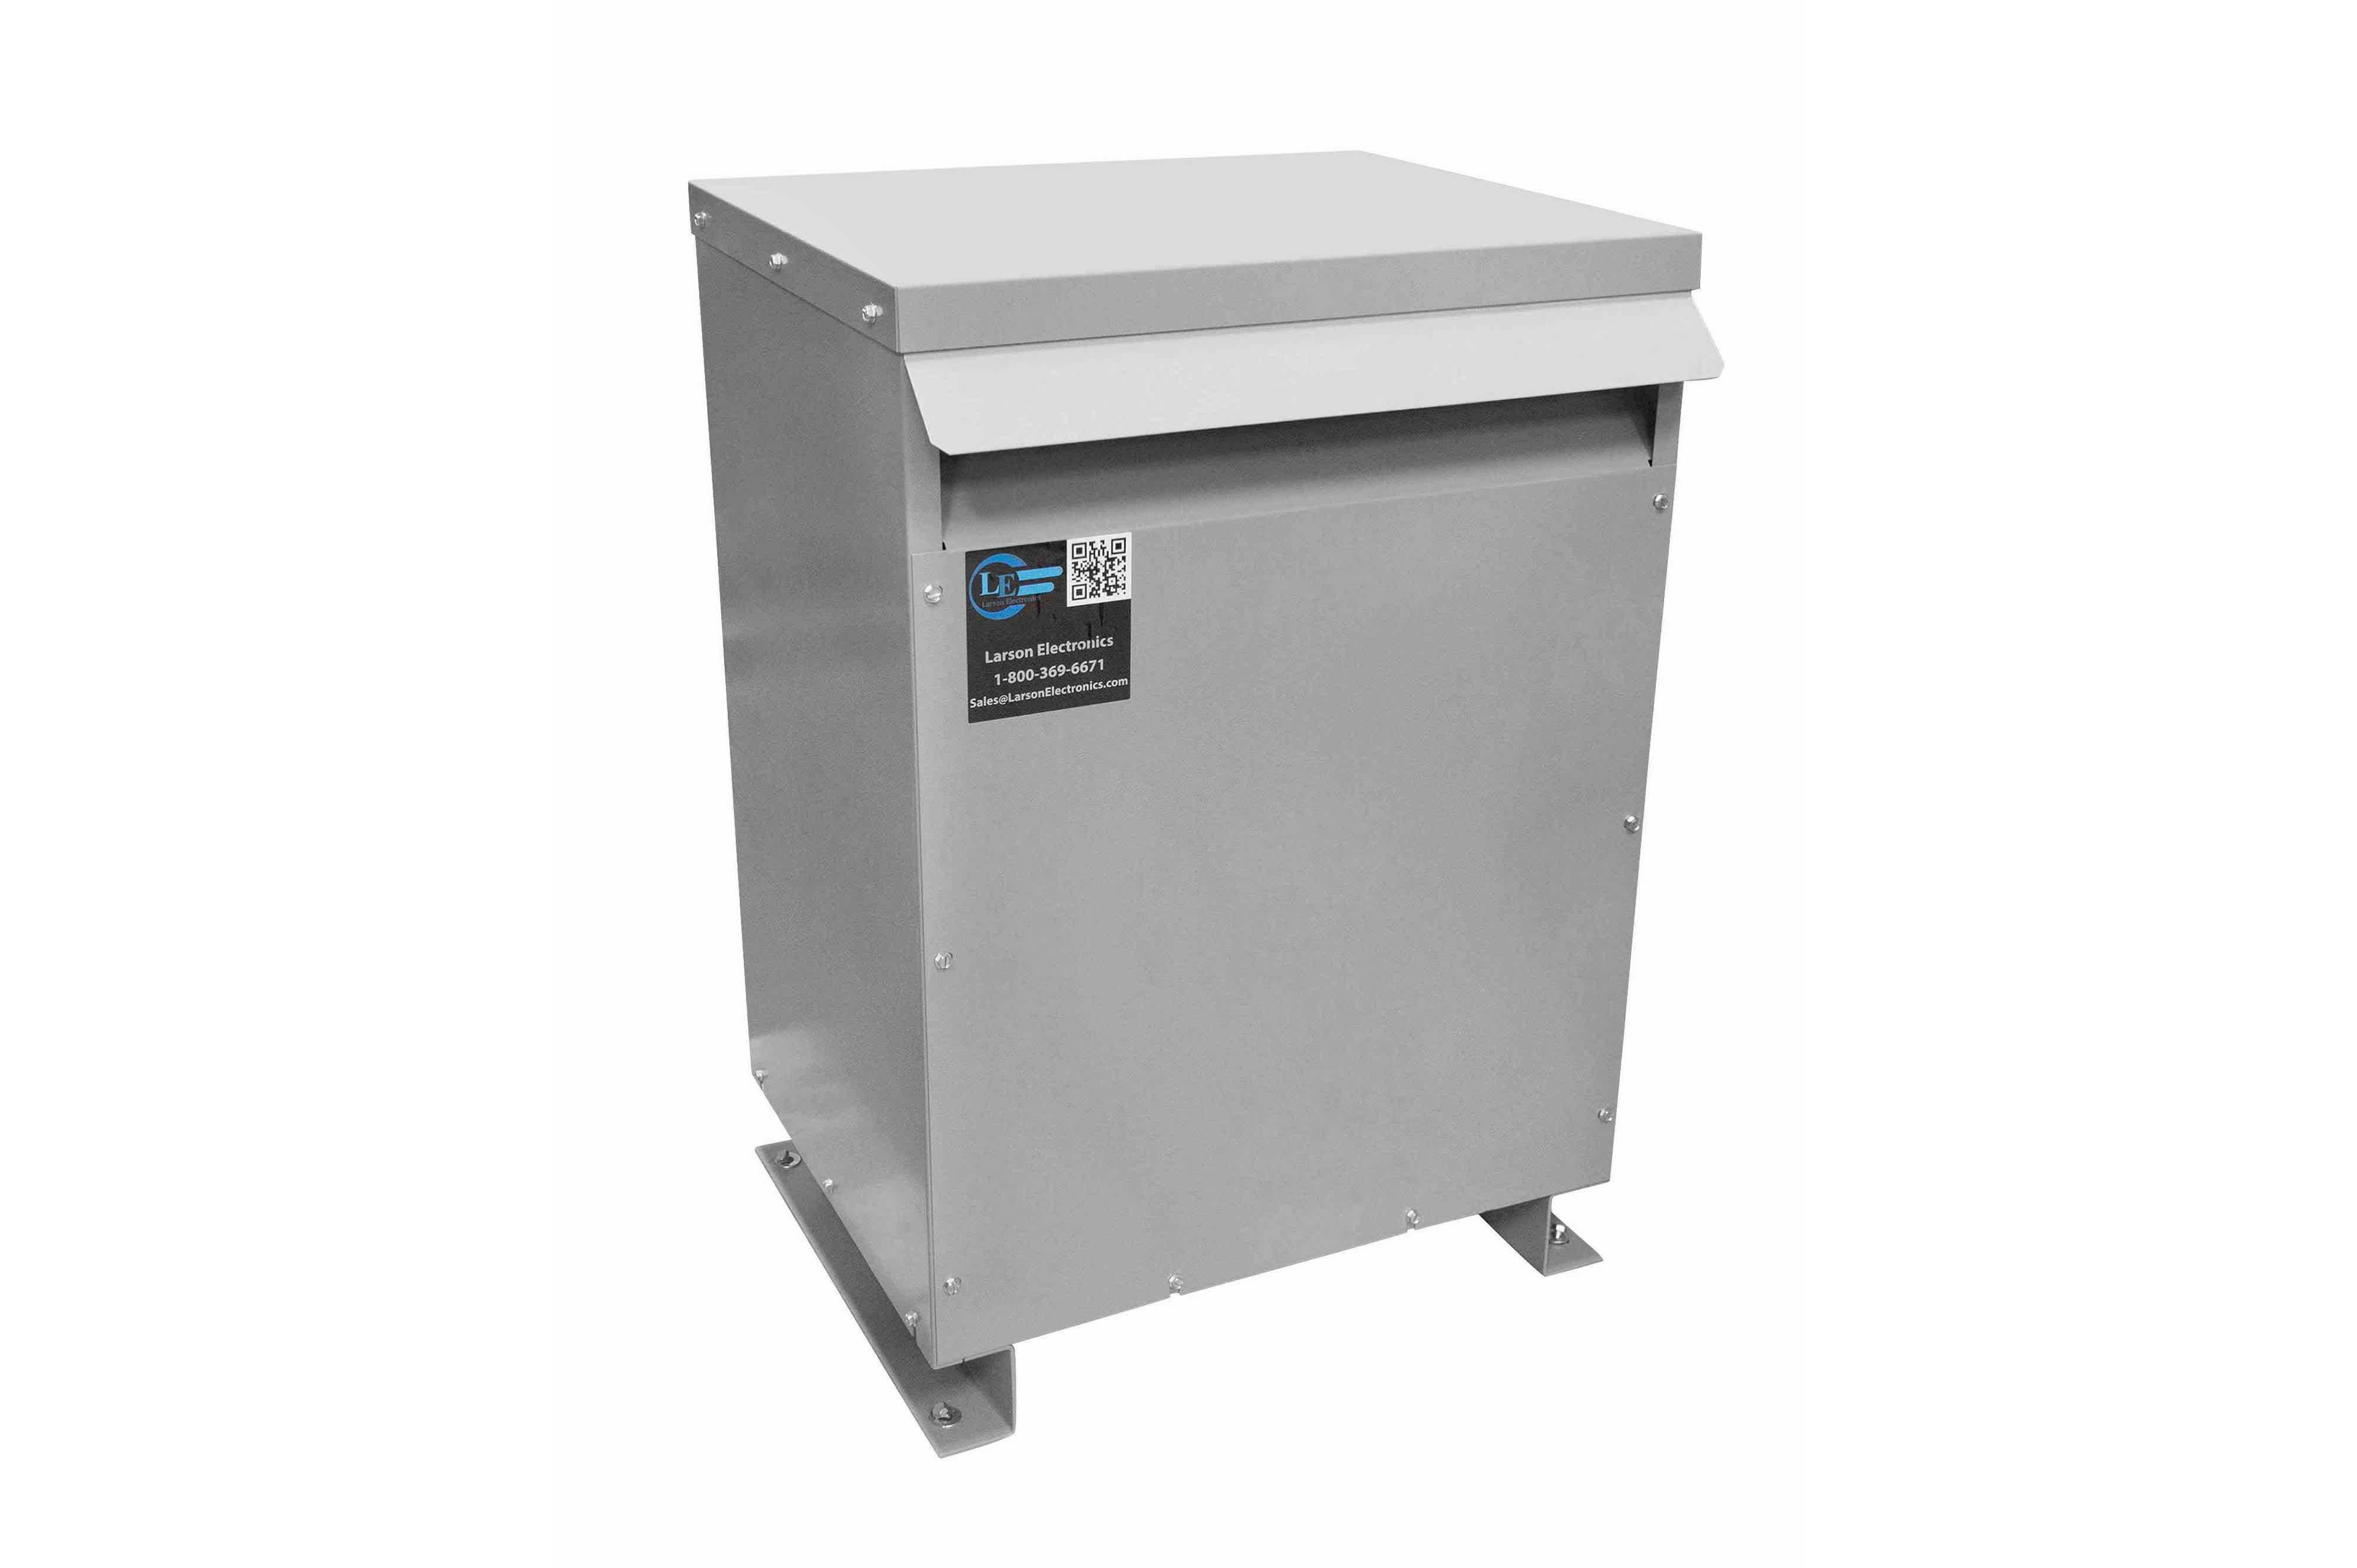 40 kVA 3PH Isolation Transformer, 460V Wye Primary, 600Y/347 Wye-N Secondary, N3R, Ventilated, 60 Hz